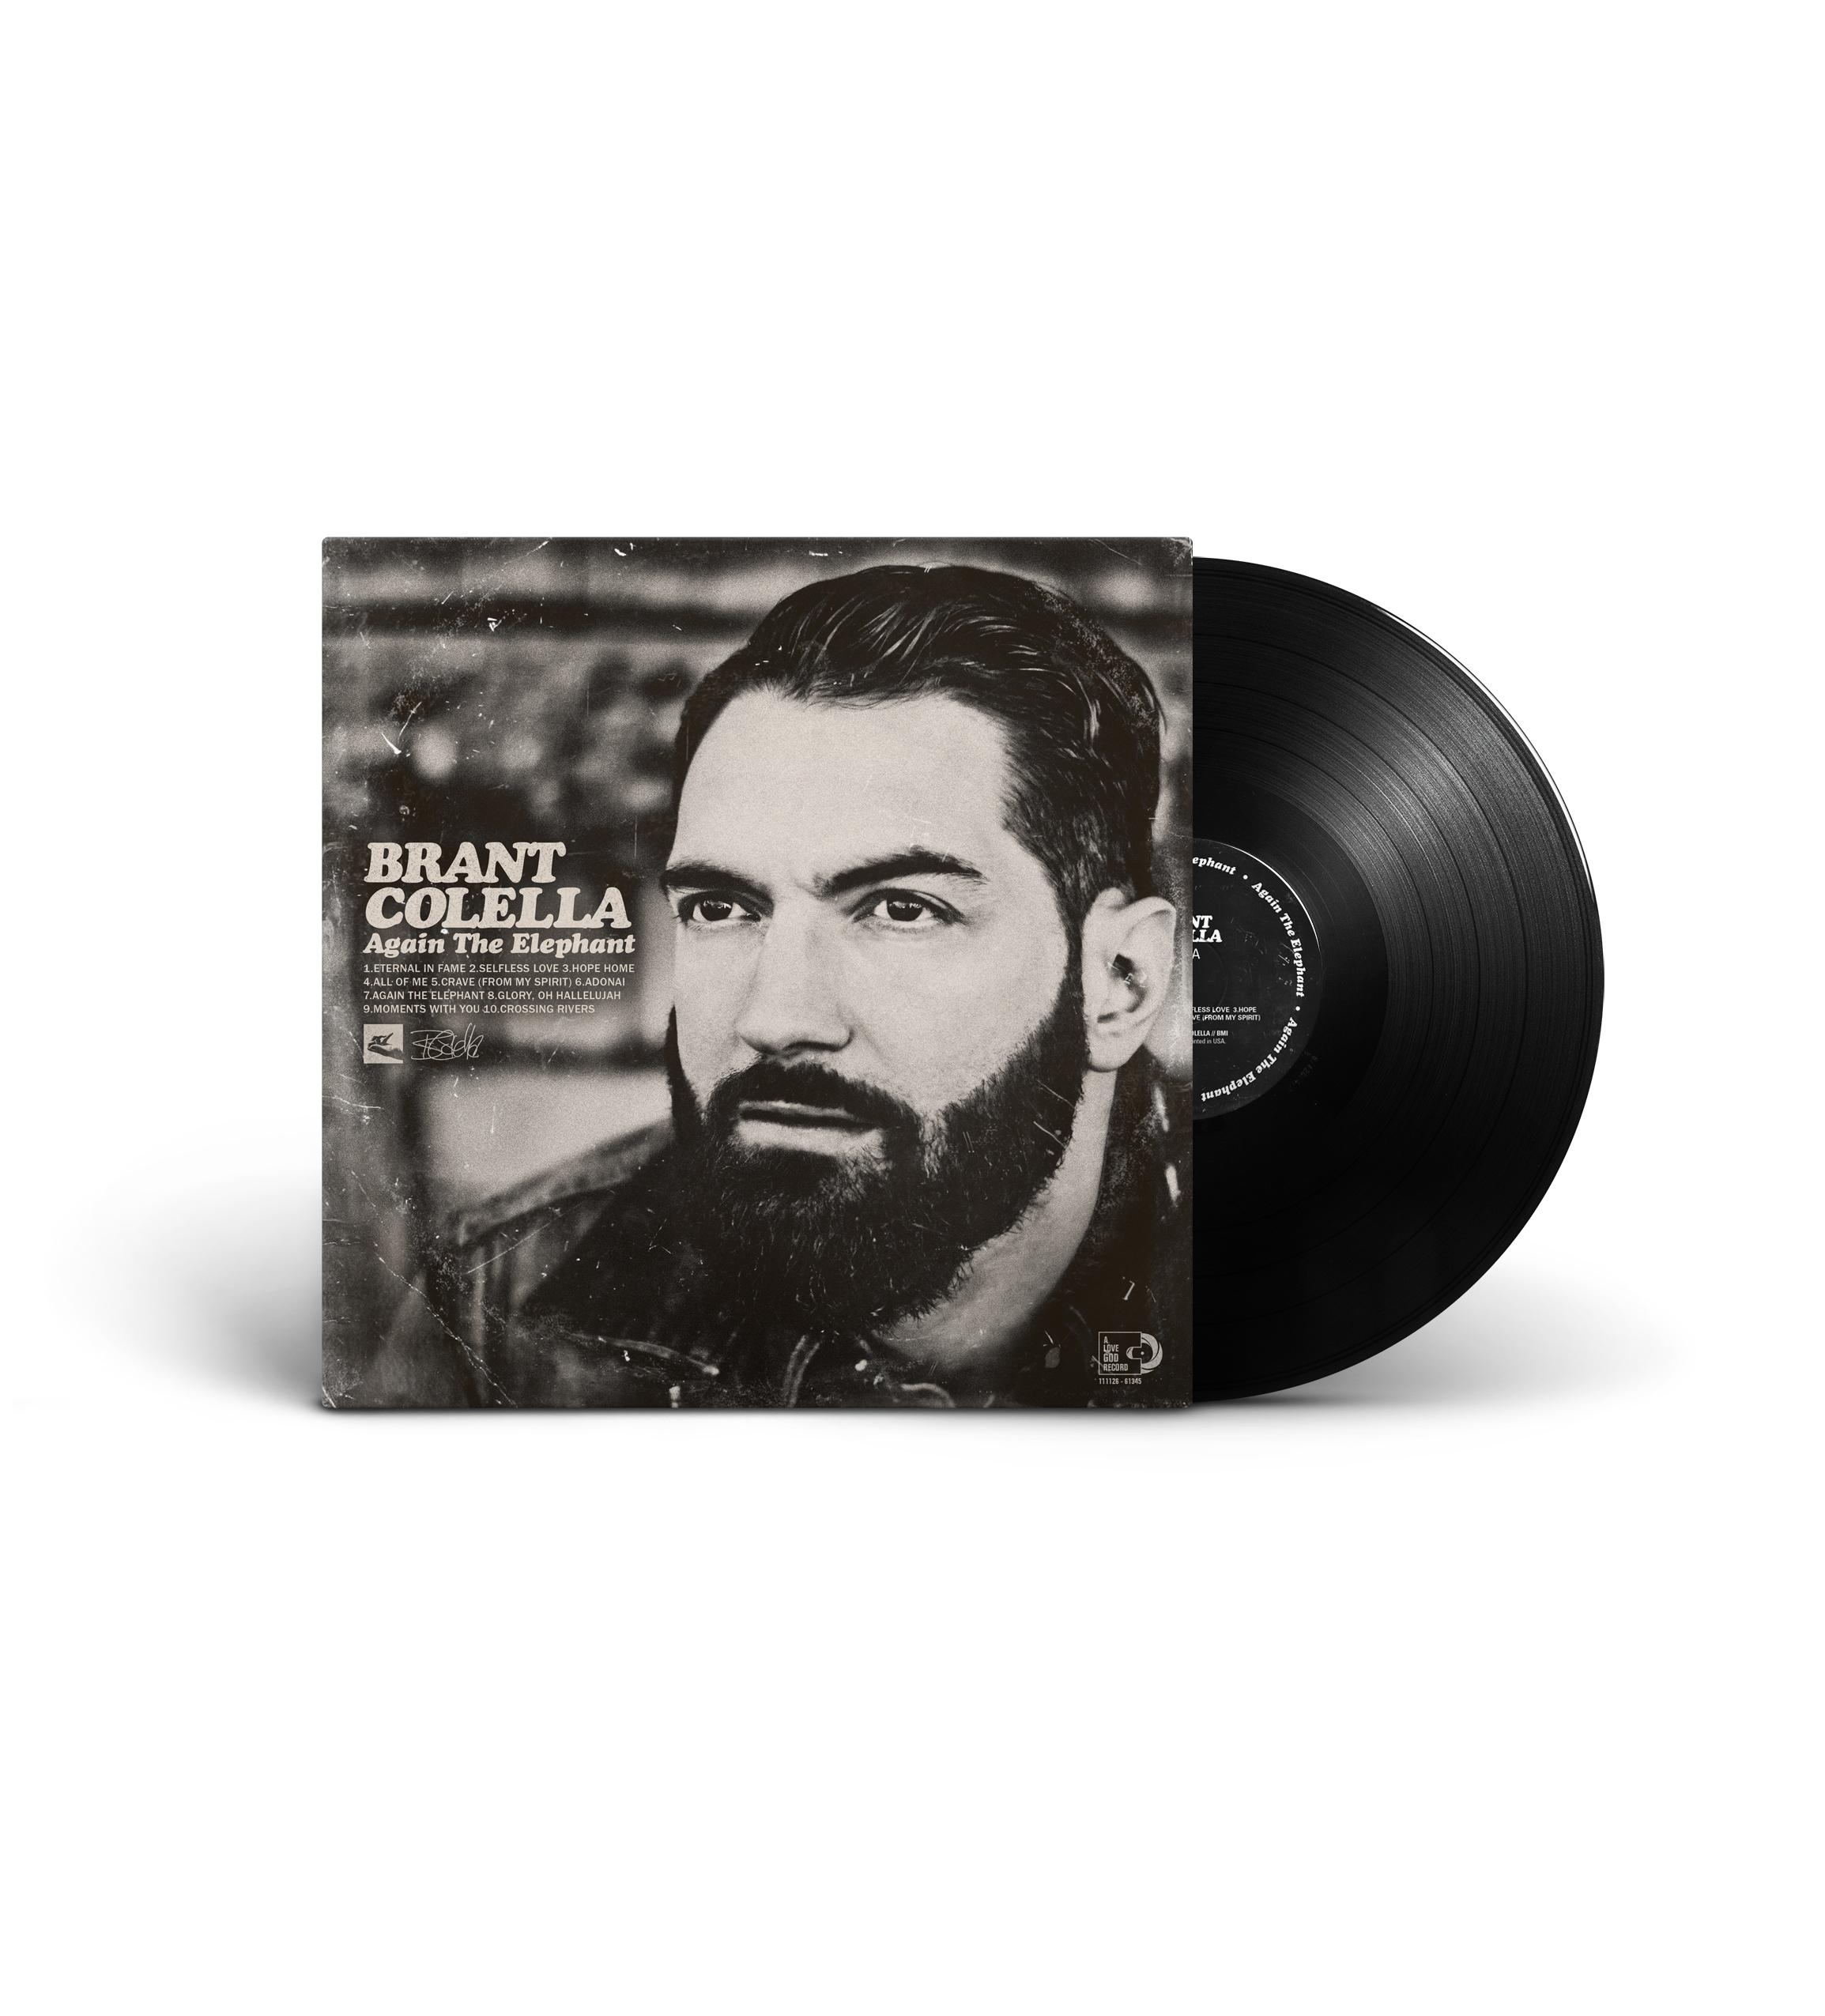 Again The Elephant Brant Colella - vinyl2.JPG